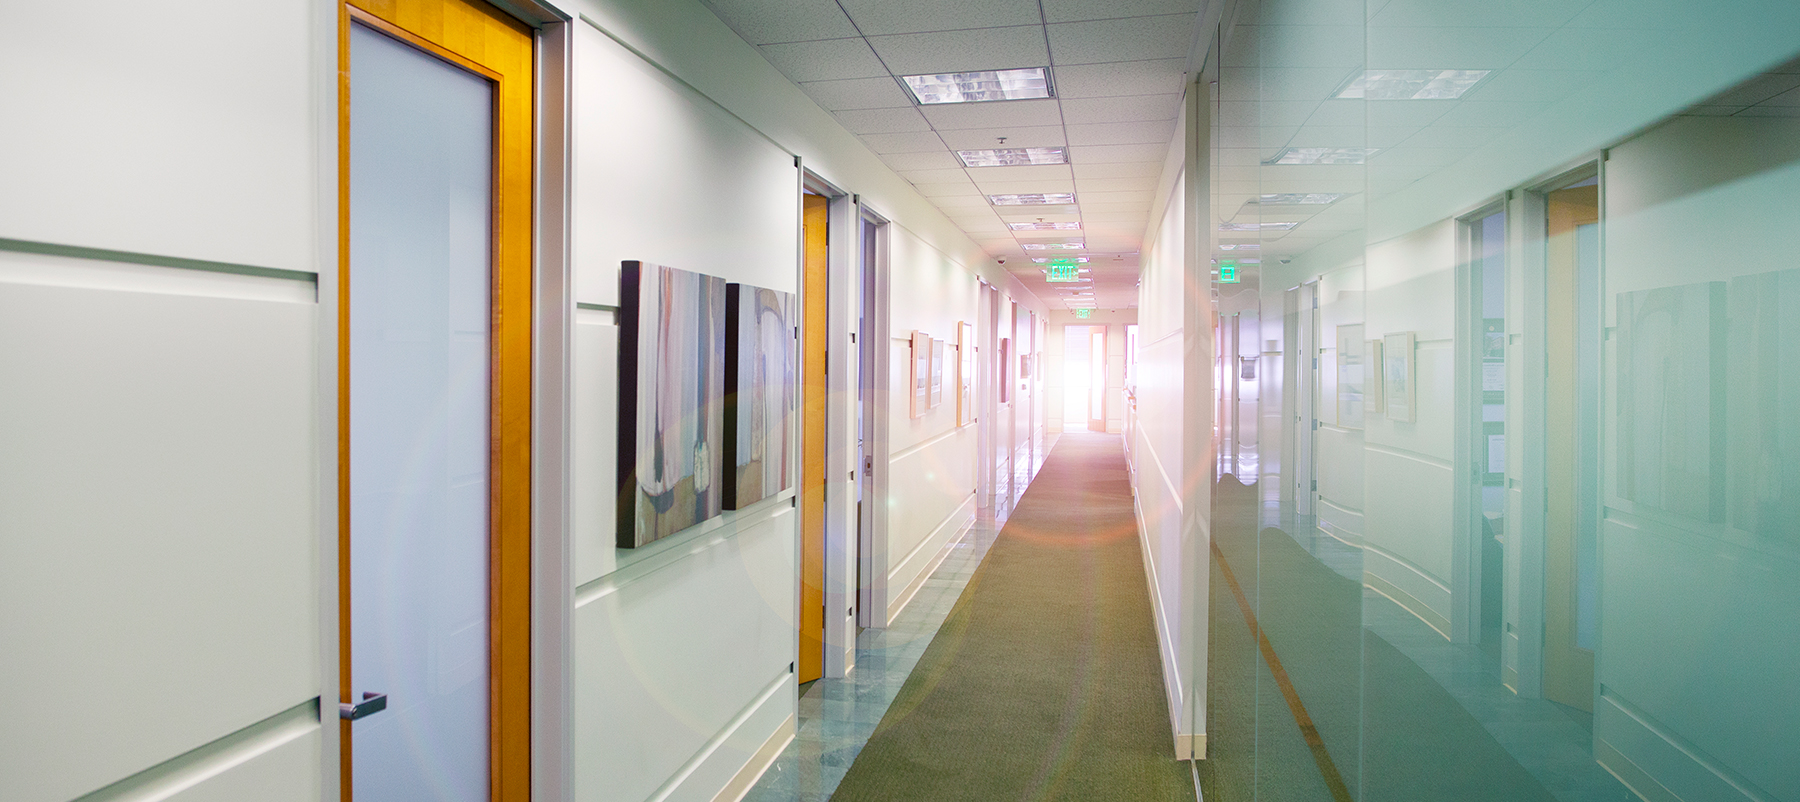 Kimball-Hall-Architecture-RAKLAW1.jpg